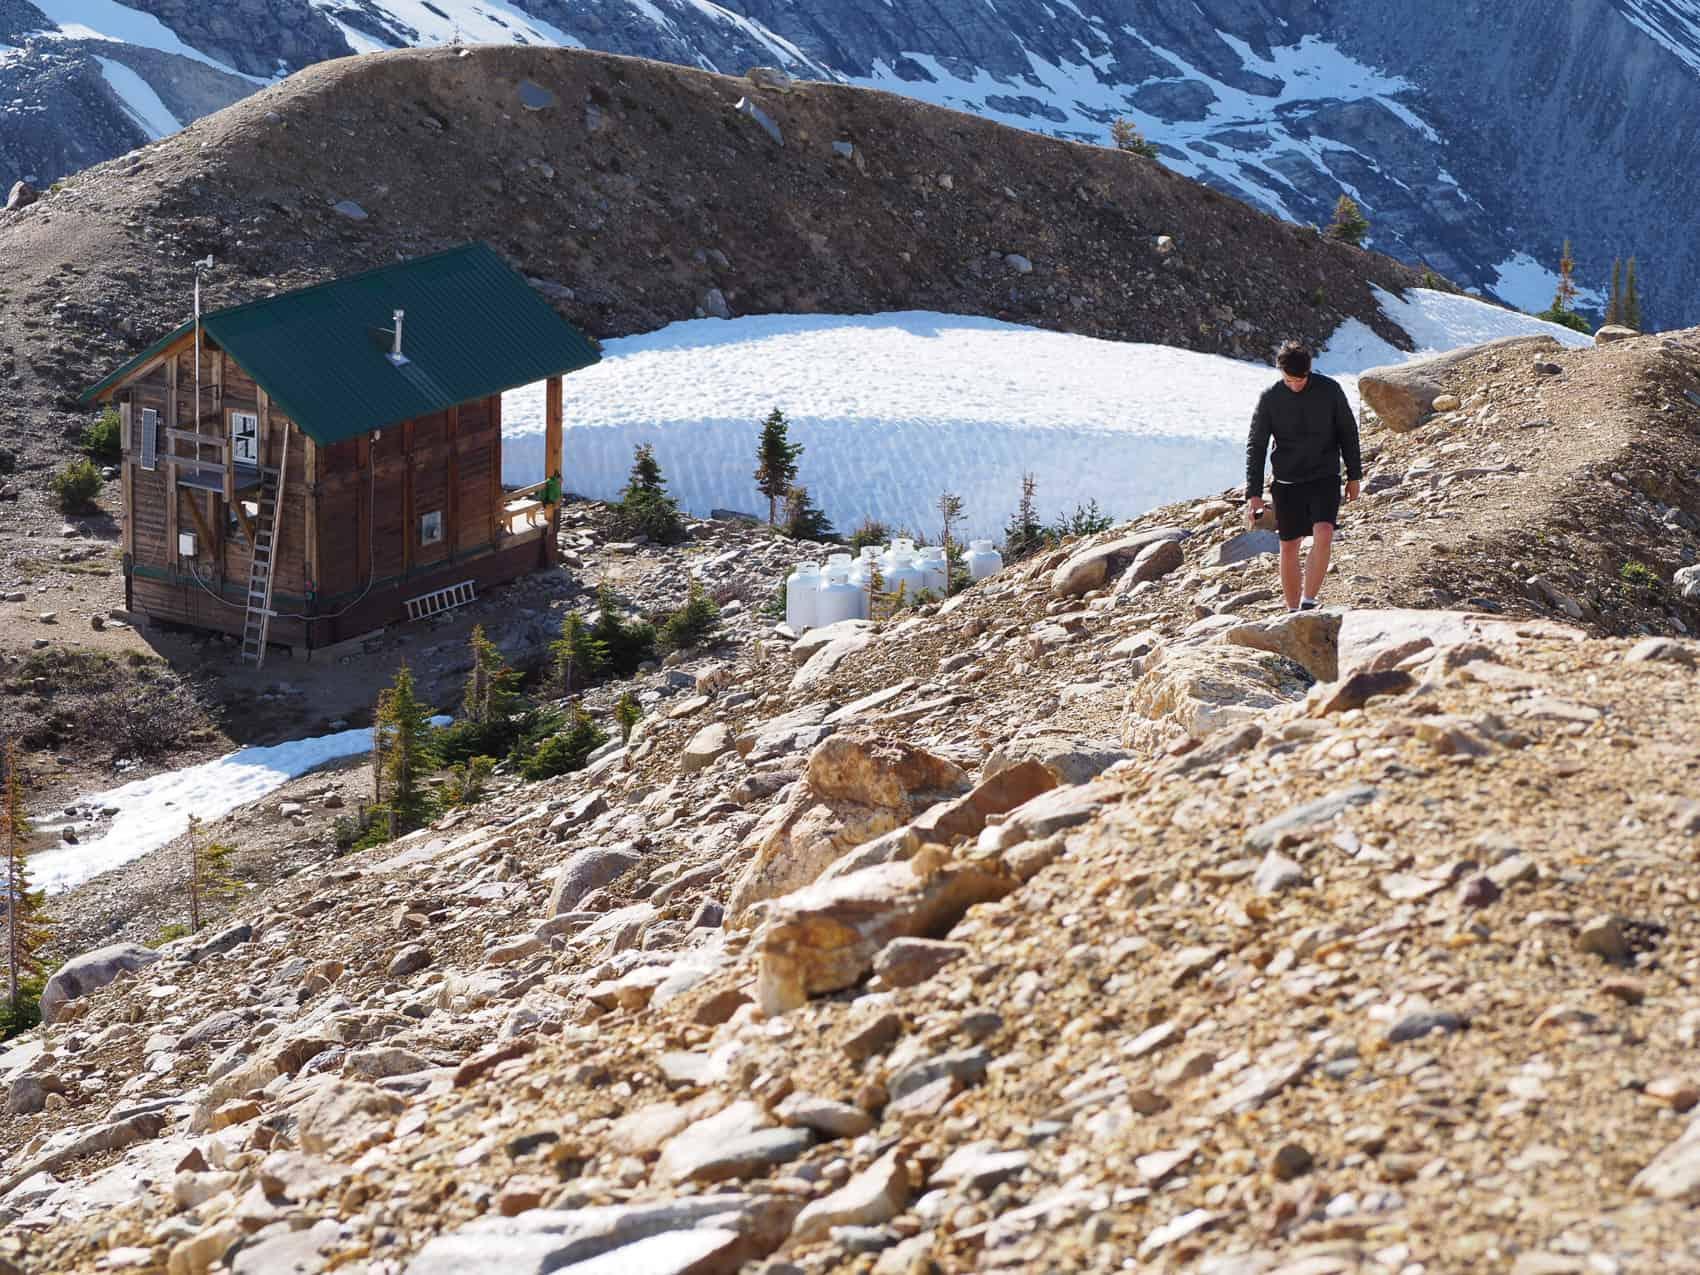 Asulkan Hut Glacier National Park